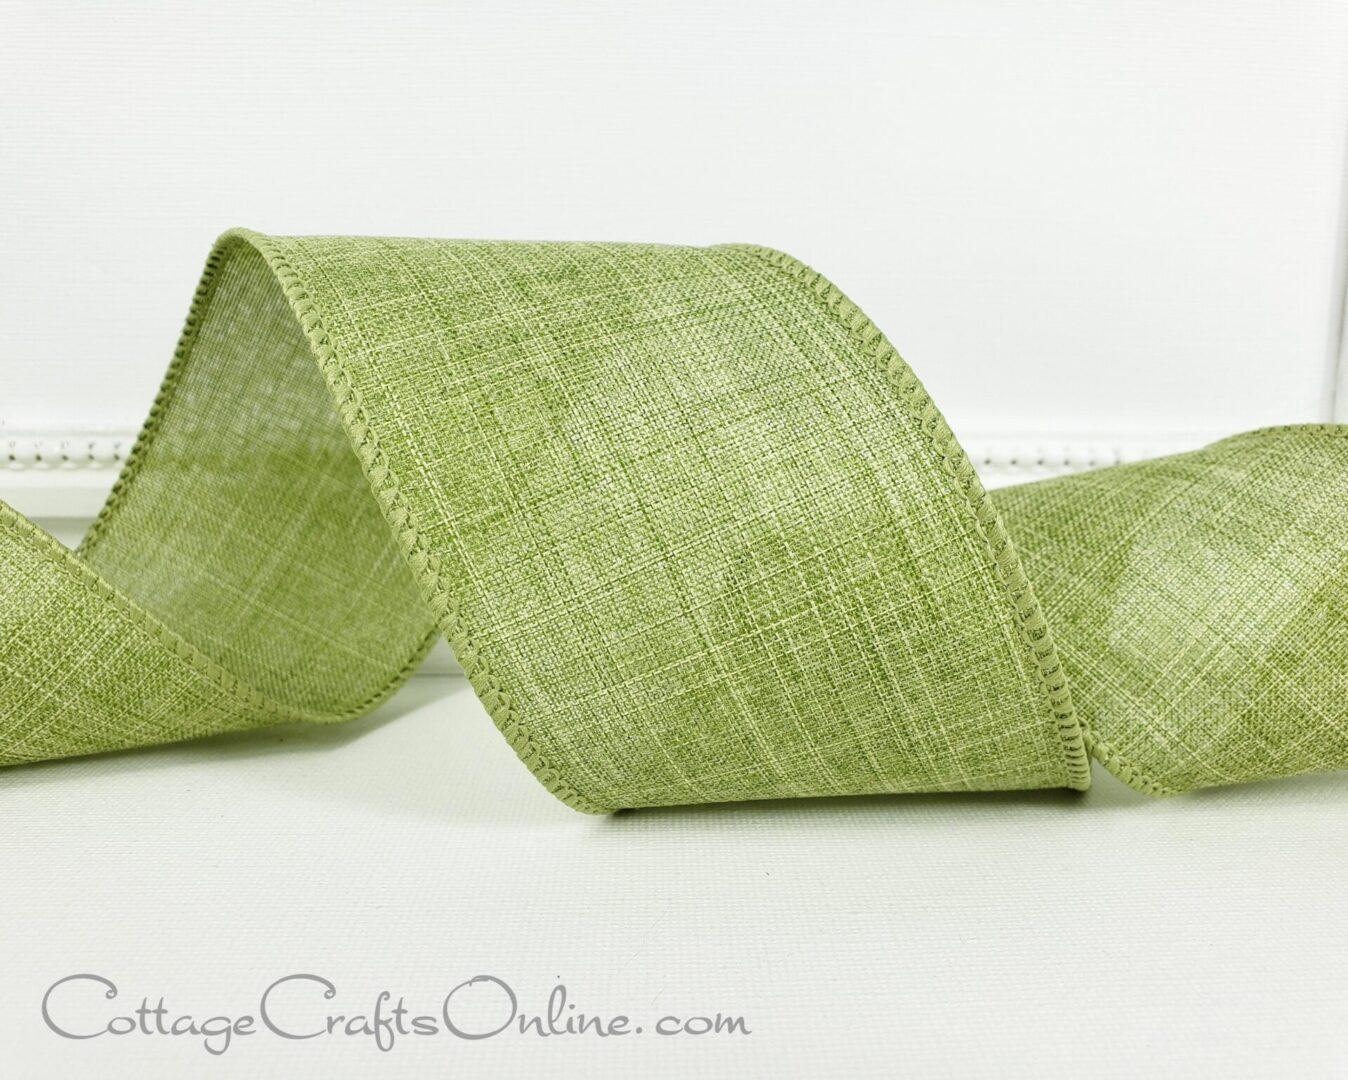 green fern moss sage divinely royal cb 40